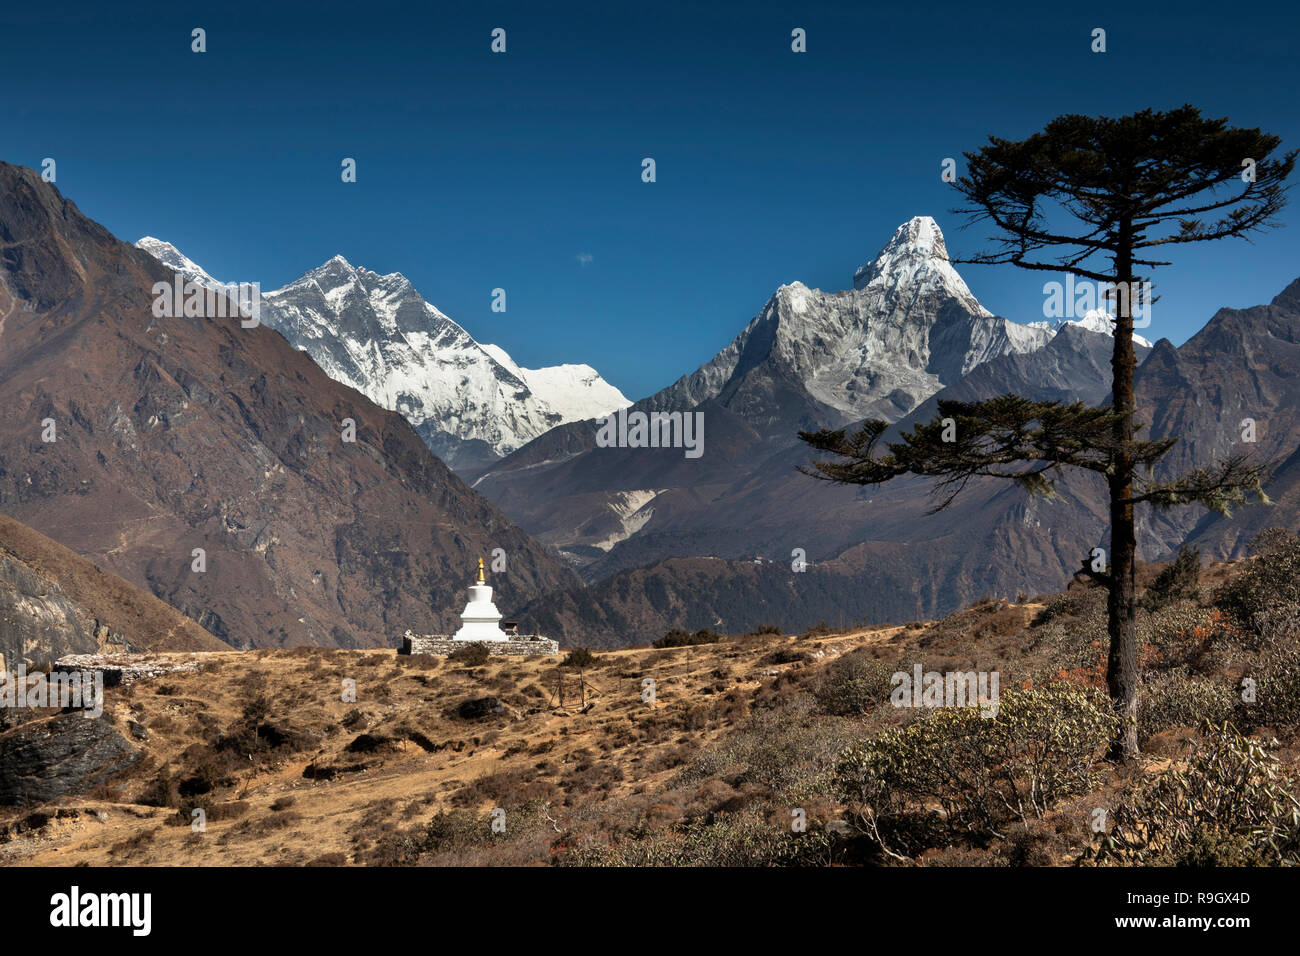 Nepal, Everest Base Camp Trek, Khumjung, new high altitude chorten with views of Himalayan mountains - Stock Image